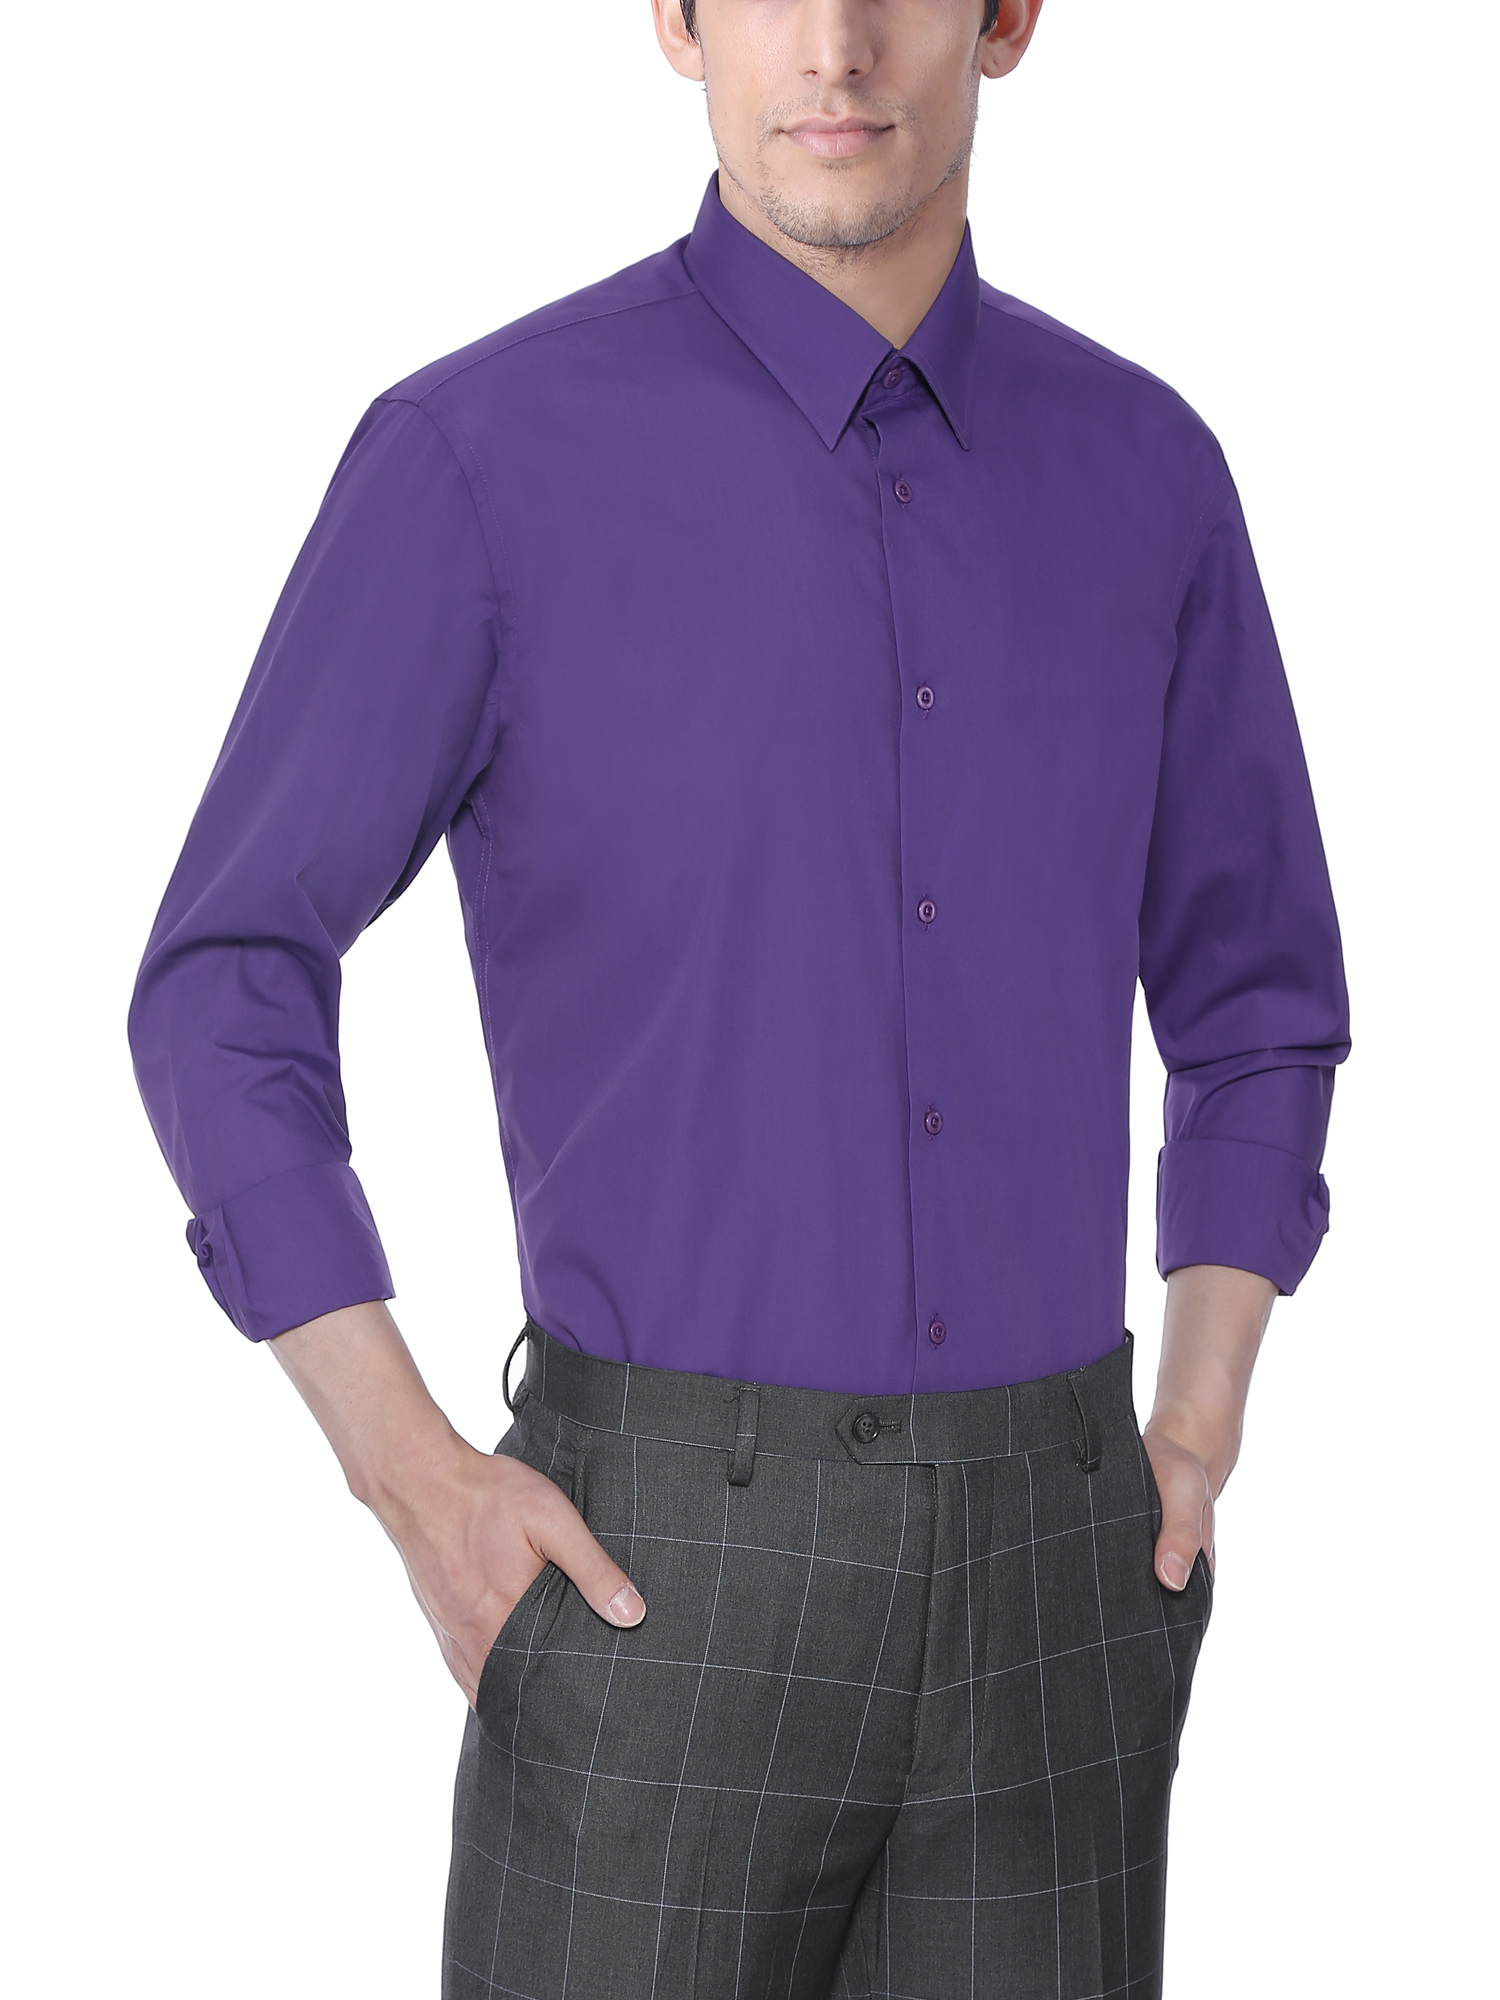 Verno Mens Long Sleeve Lilac Color Slim Fit Dress Shirts